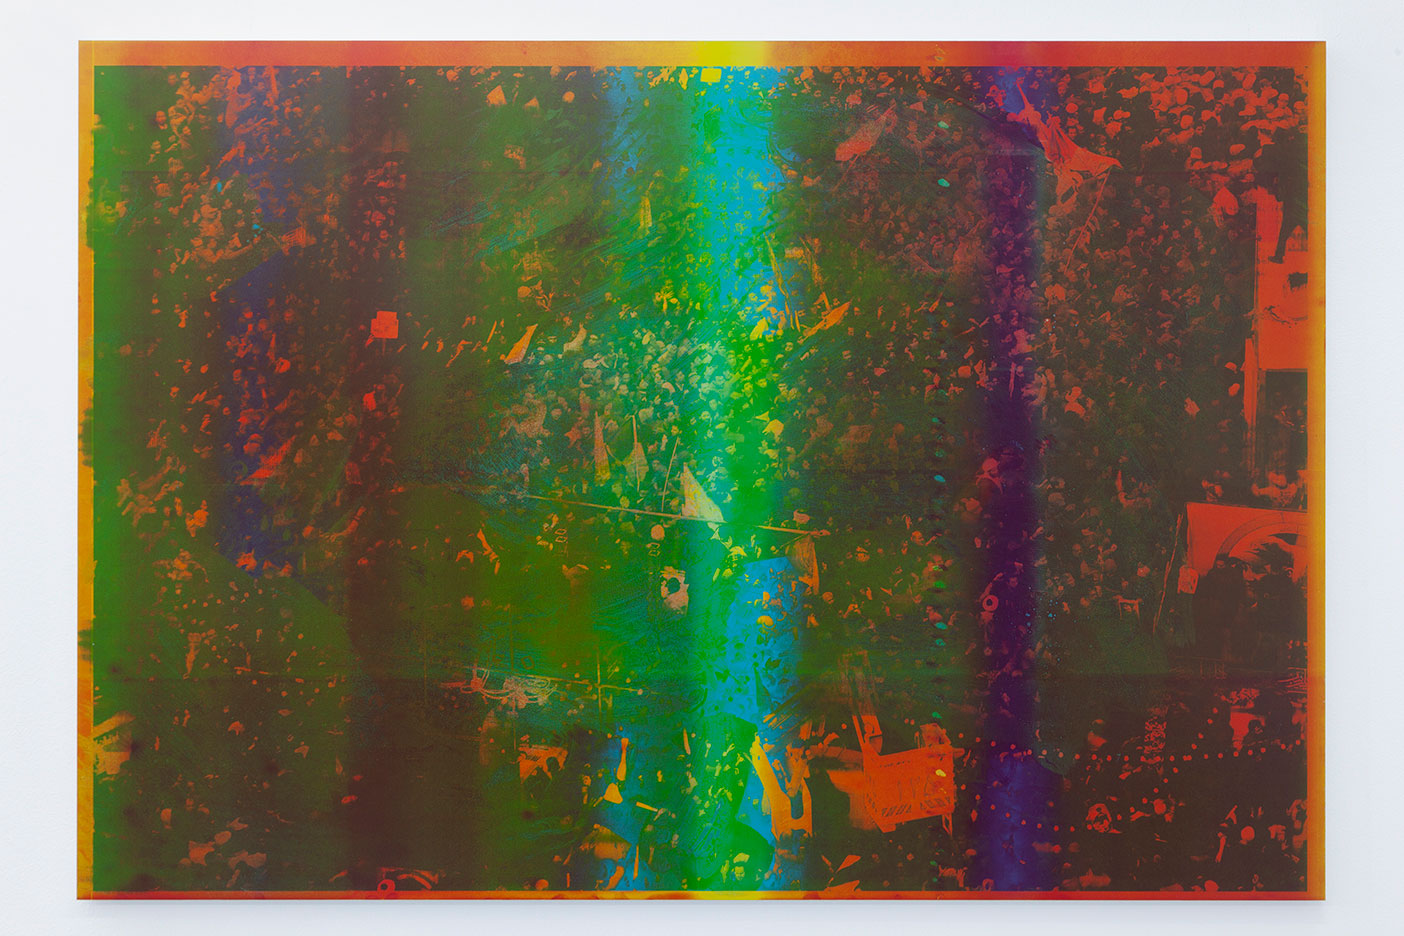 2---Emmanuel-Van-der-Auwera,-Memento-24-(Study-for-Tehran-I),-2020,-Newspaper-.3mm-aluminum-offset-plate-mounted-on-aluminum-frame,-69-x-99-x-2.5-cm-27-1_8-x-39-x-1-in